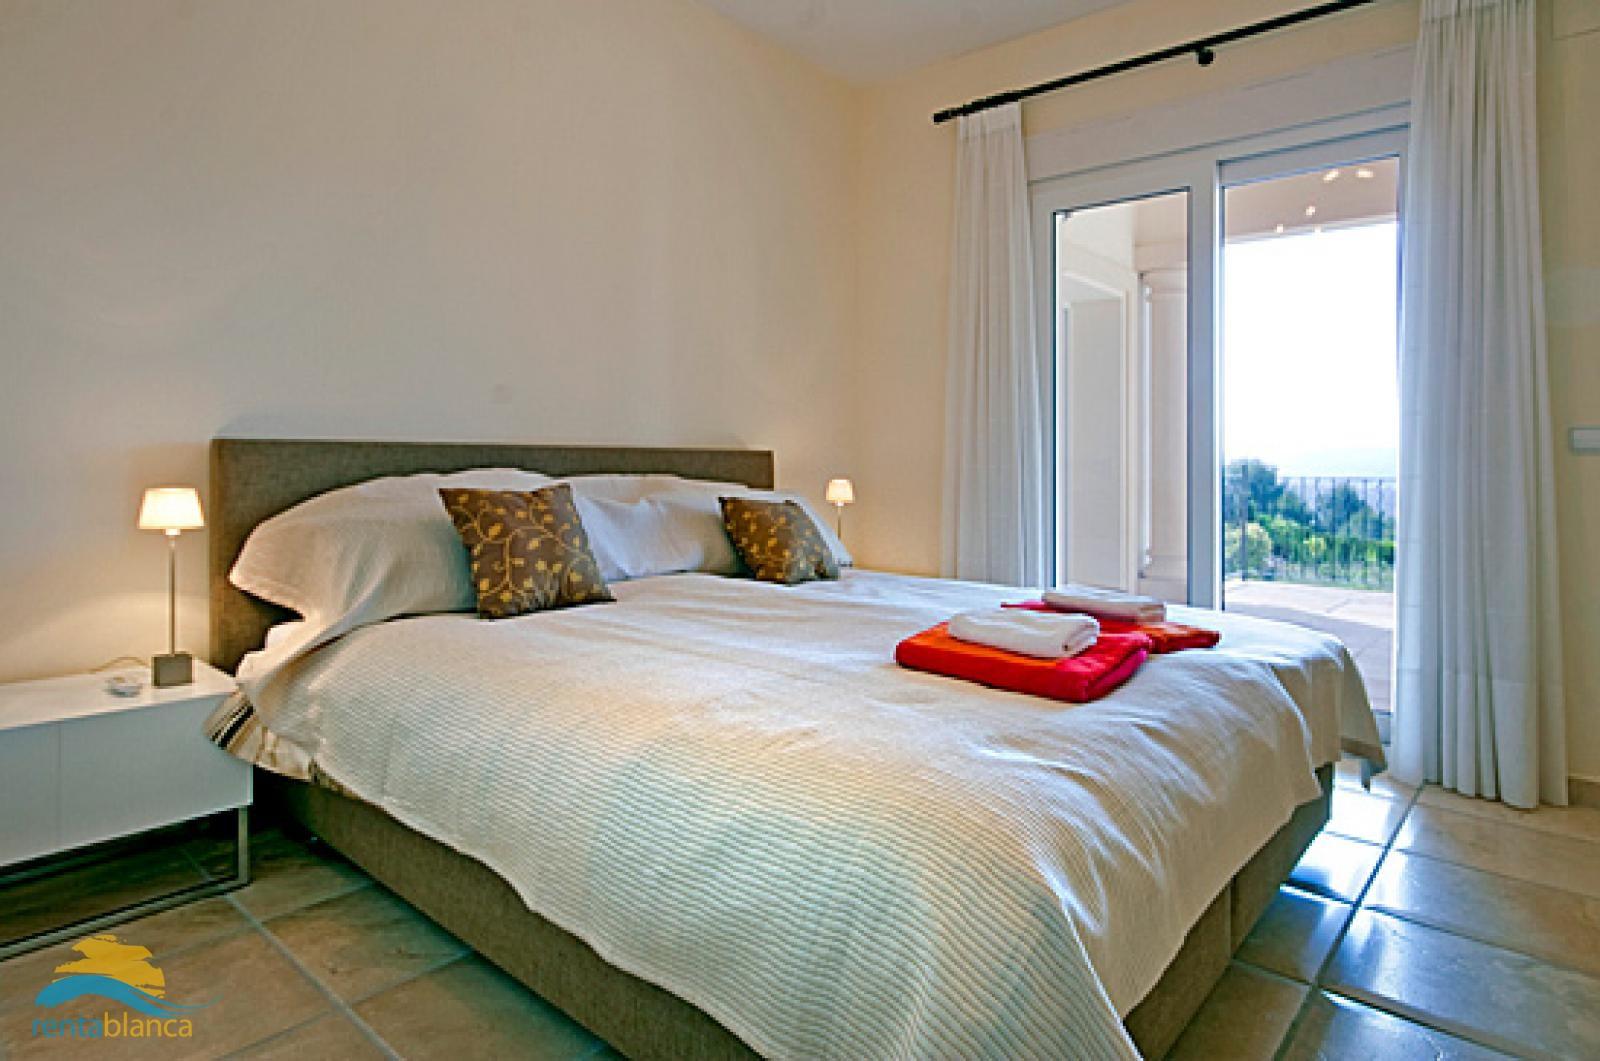 Luxurious villa gof paradise La Sella - Denia - Rentablanca